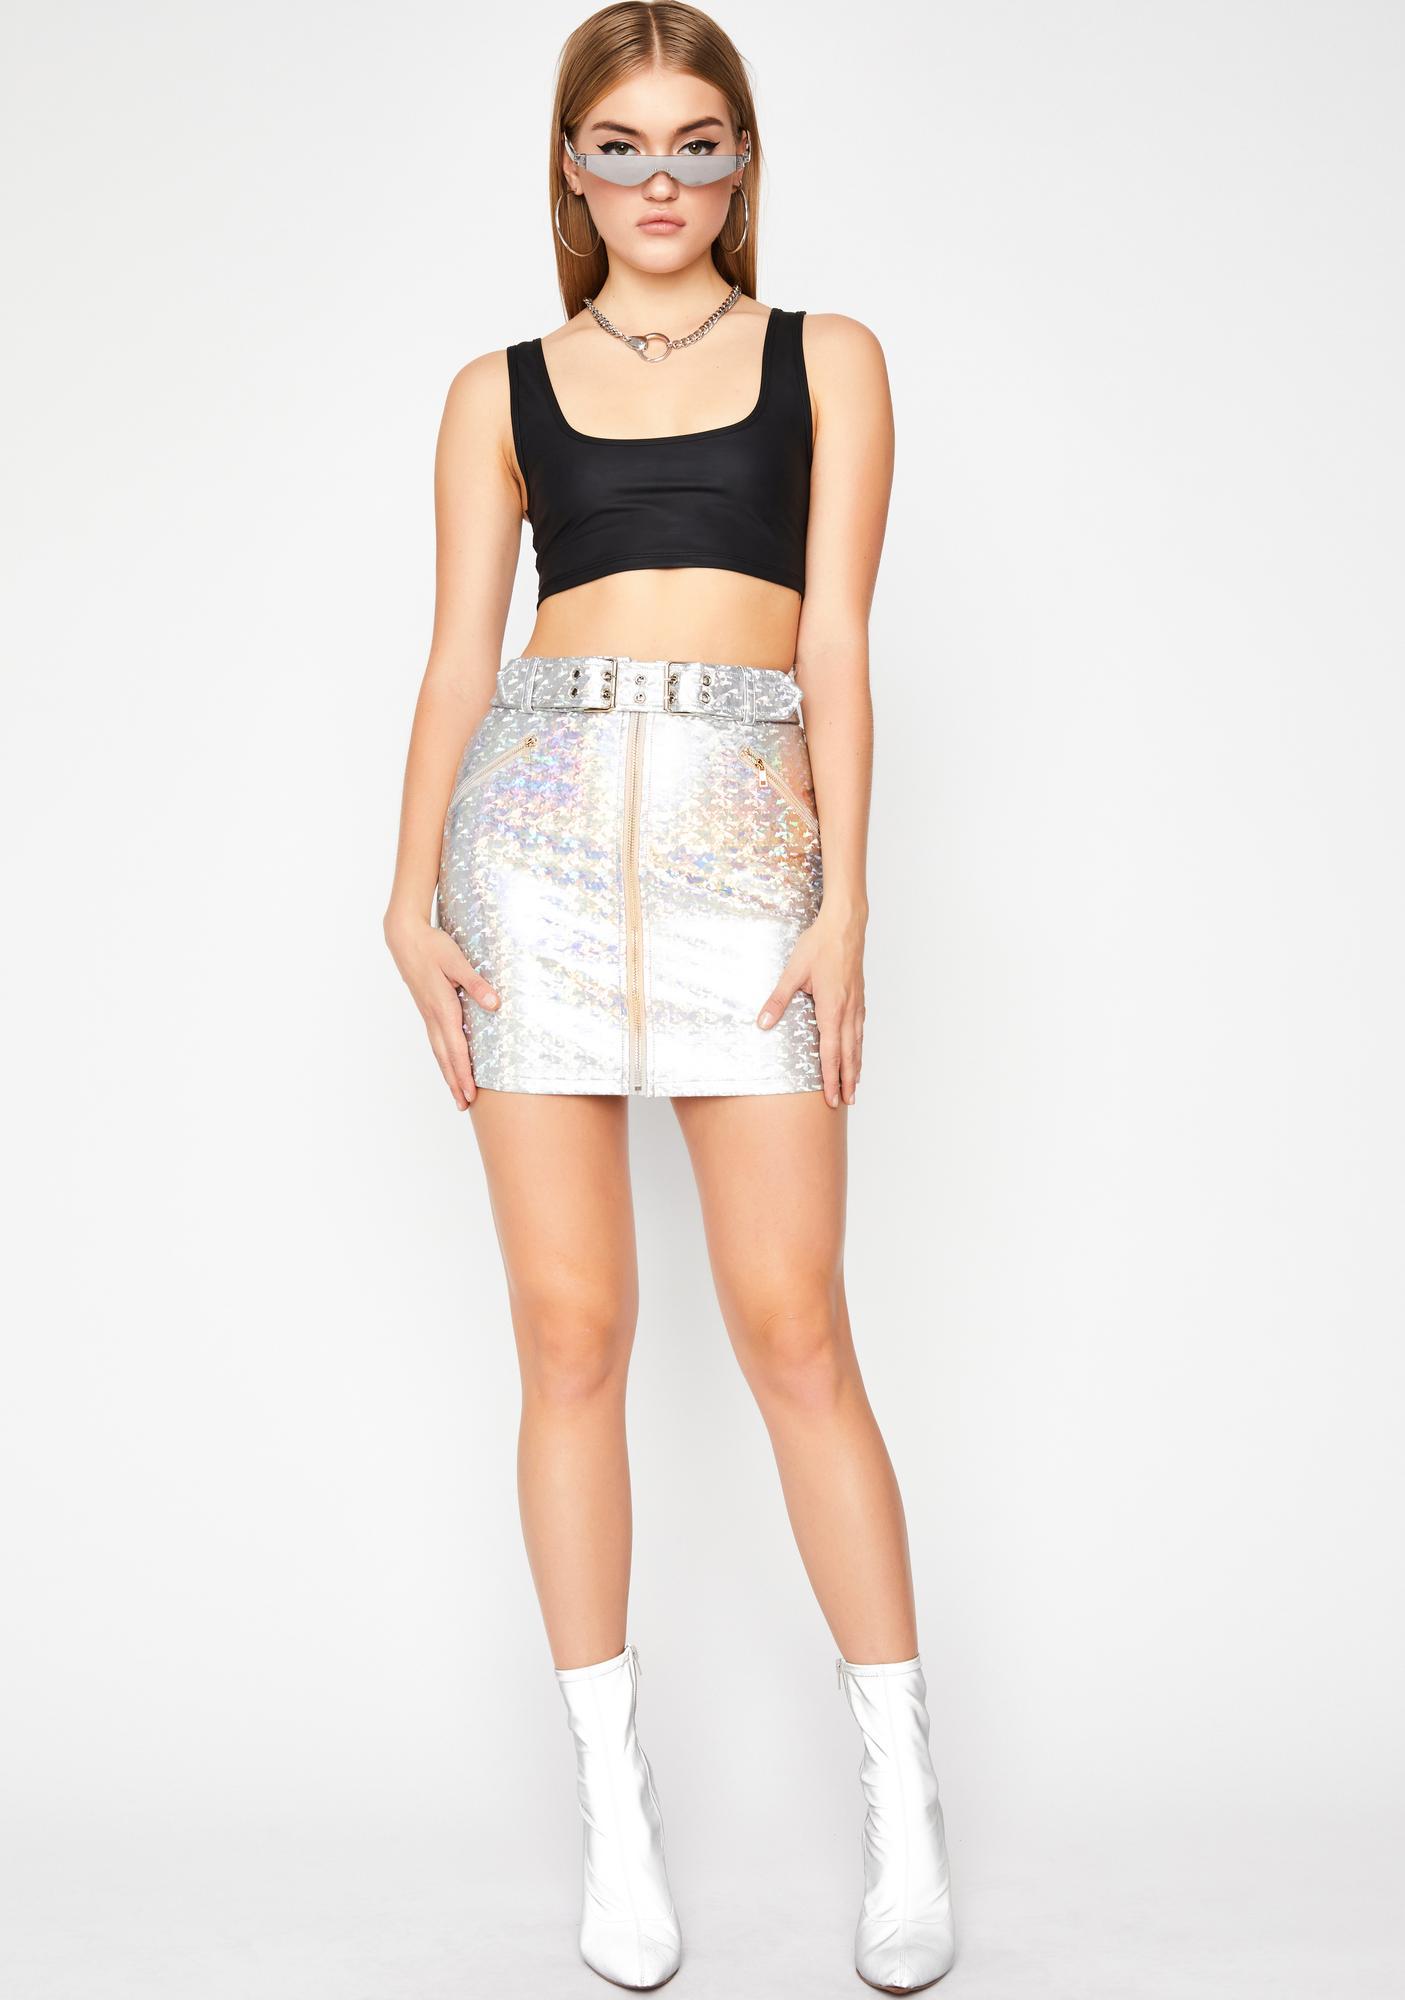 Pixxxel Perfect Holographic Skirt